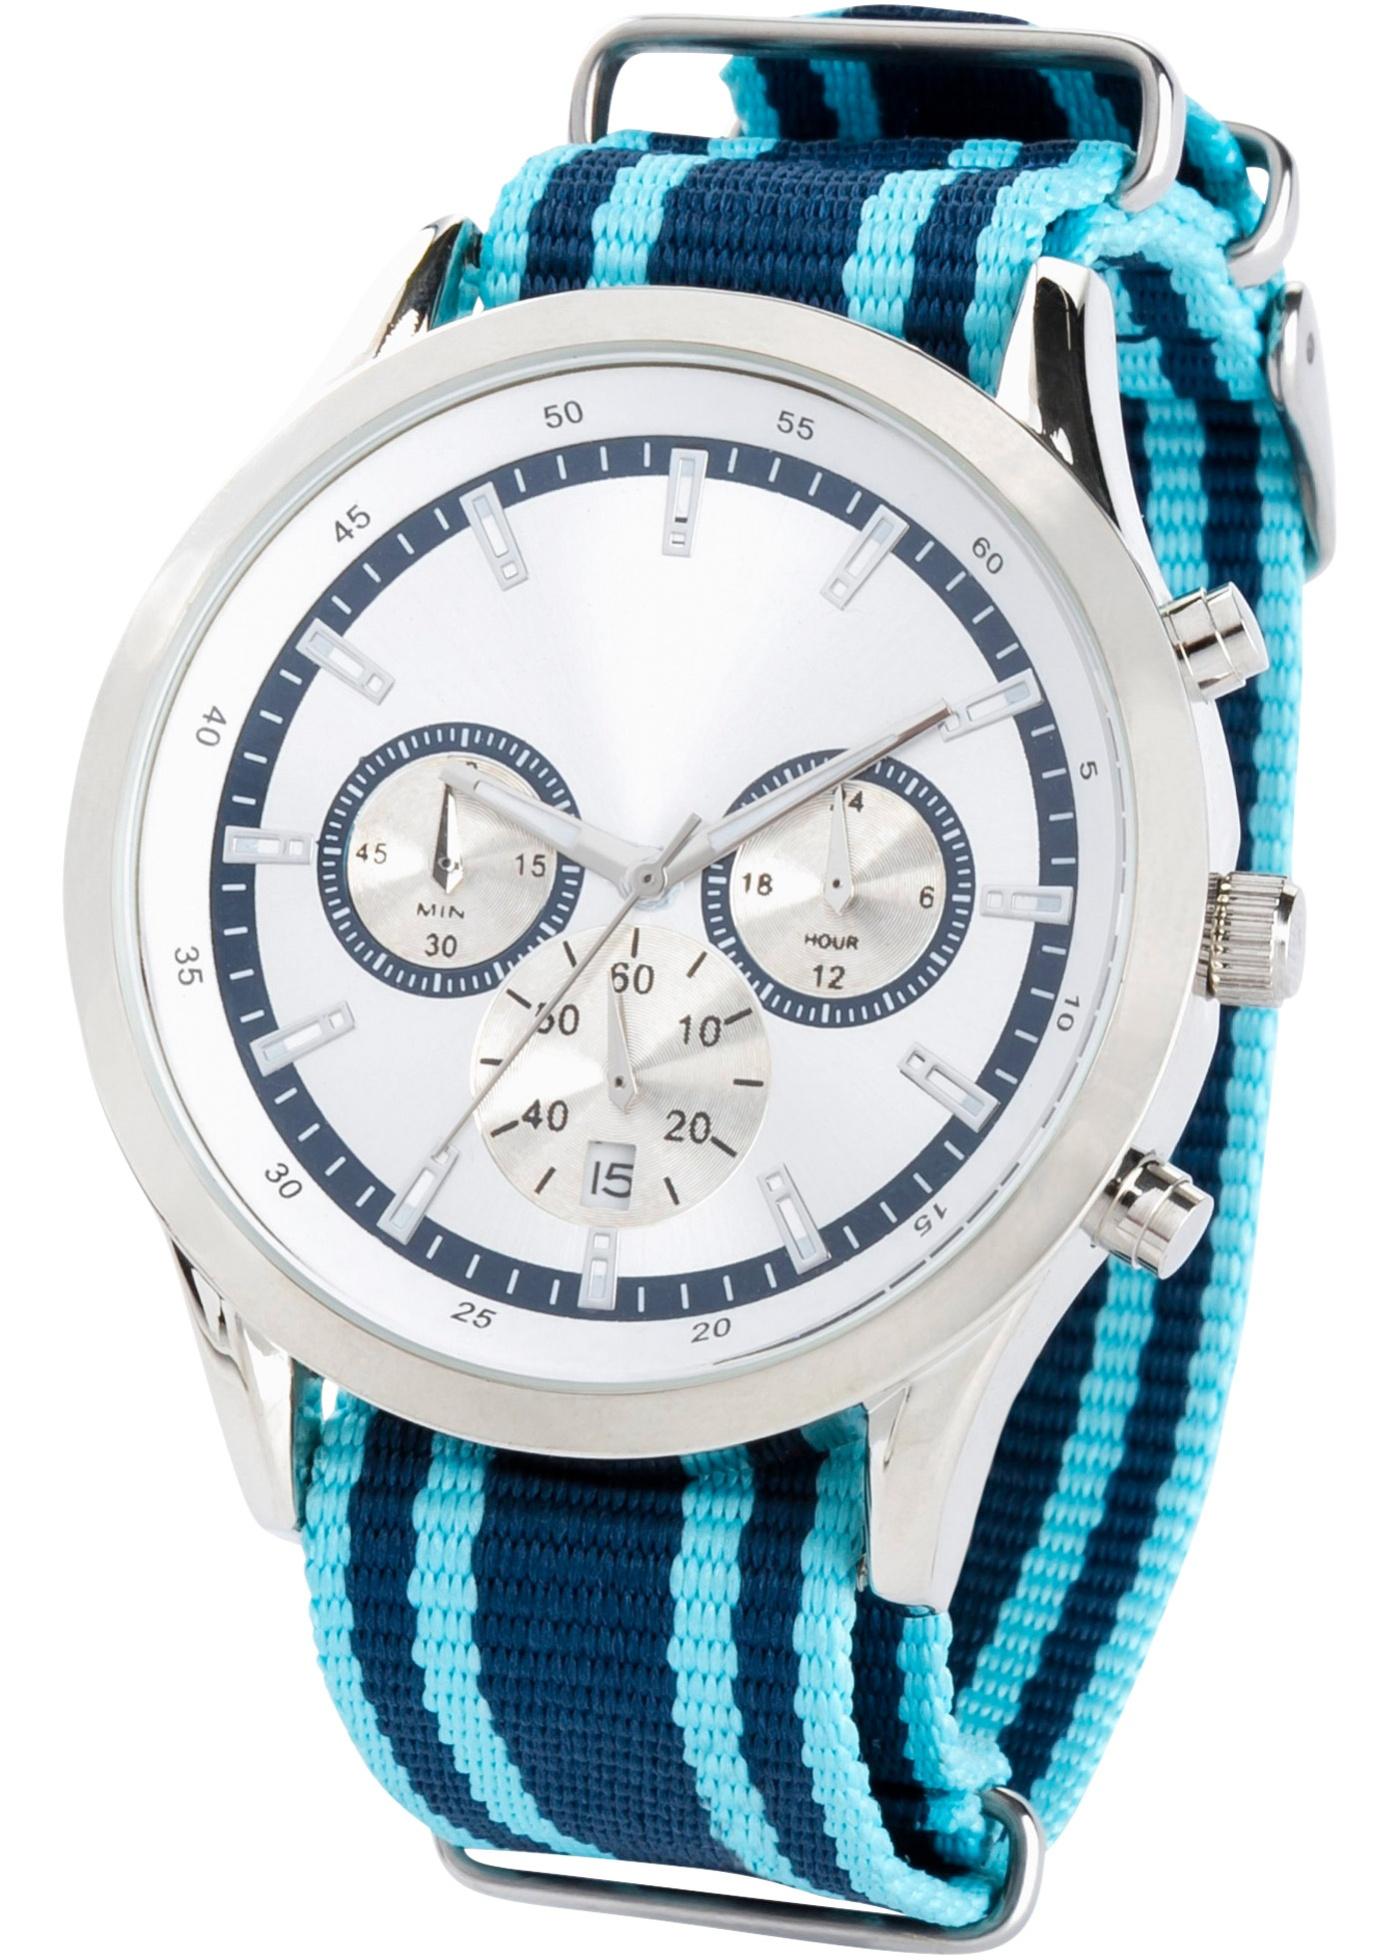 Pánské hodinky s chronografem - Fialová